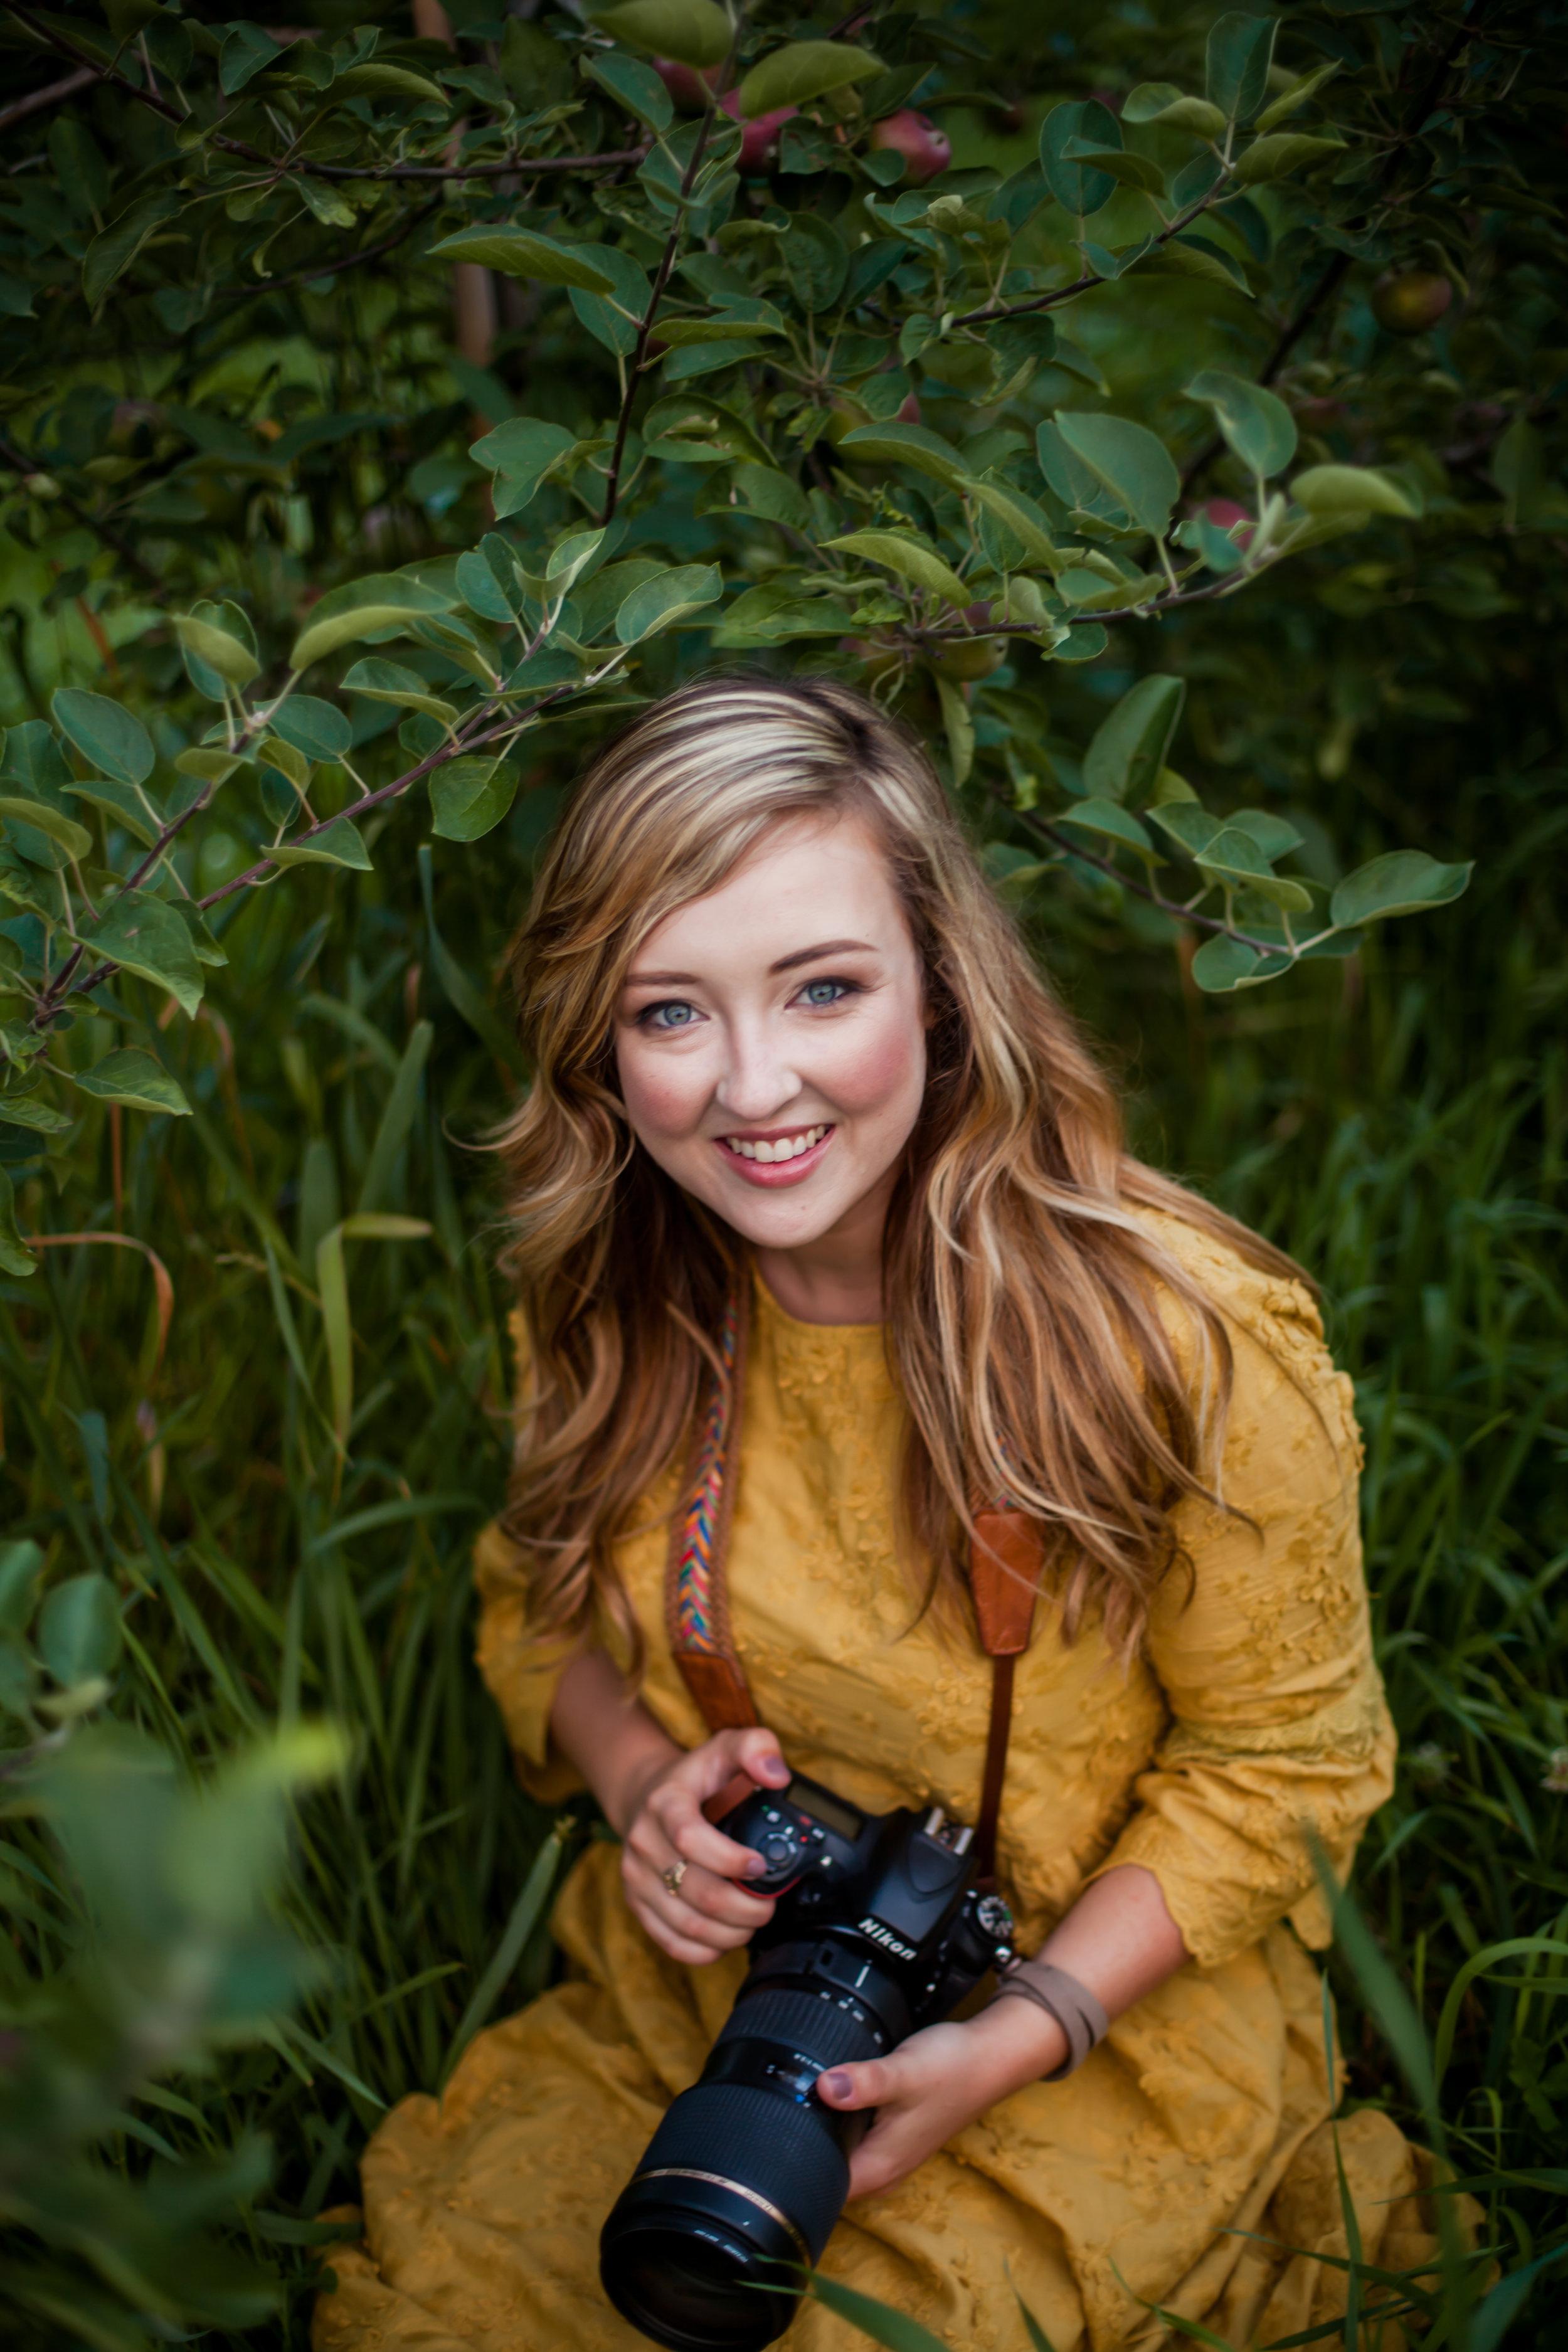 Photography education in muncie indiana mentoring mentorship kyla jo photography